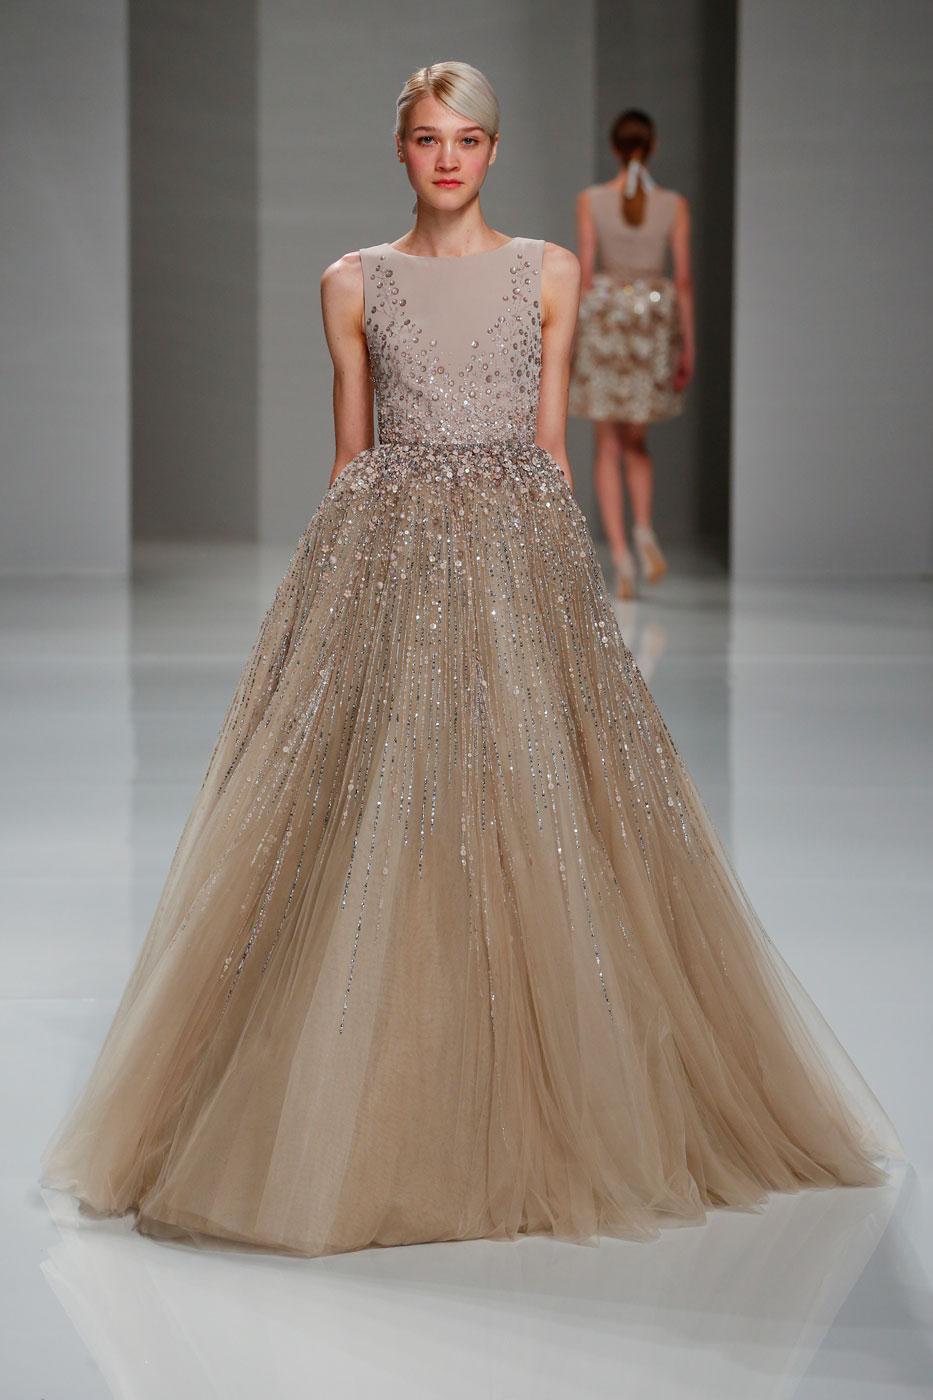 Georges-Hobeika-fashion-runway-show-haute-couture-paris-spring-2015-the-impression-55